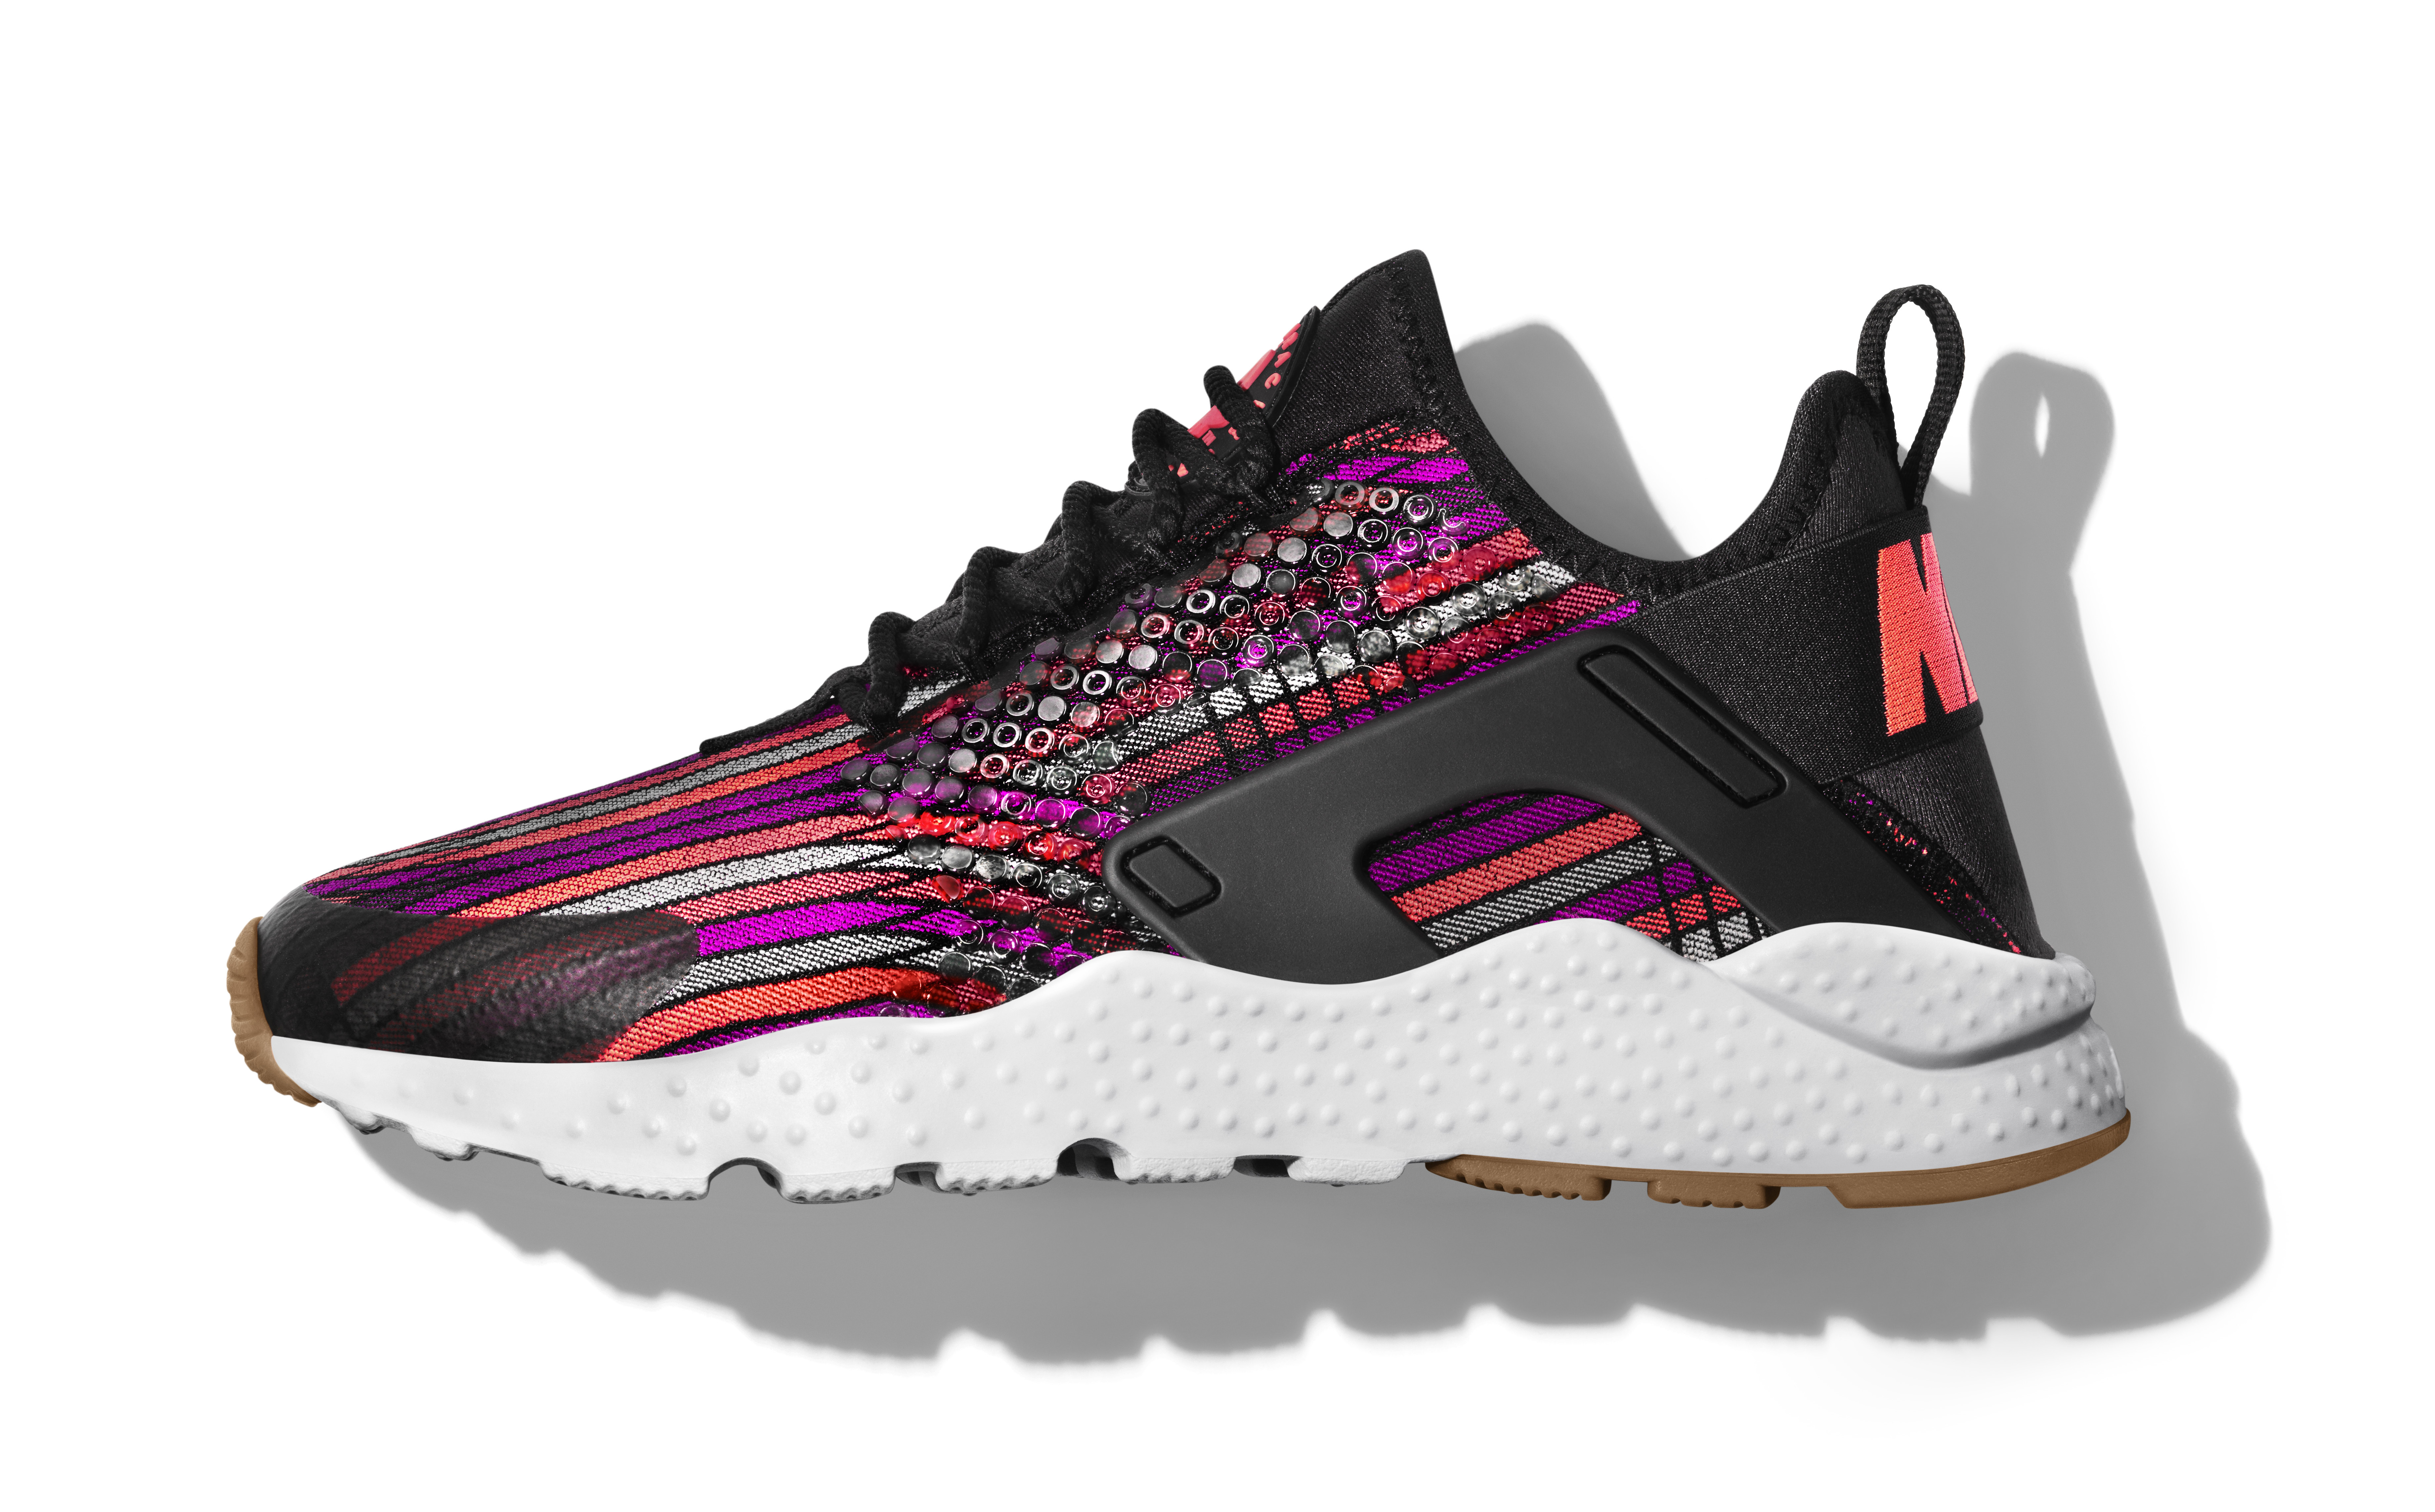 low priced 8a416 06129 Nike Huarache Ultra